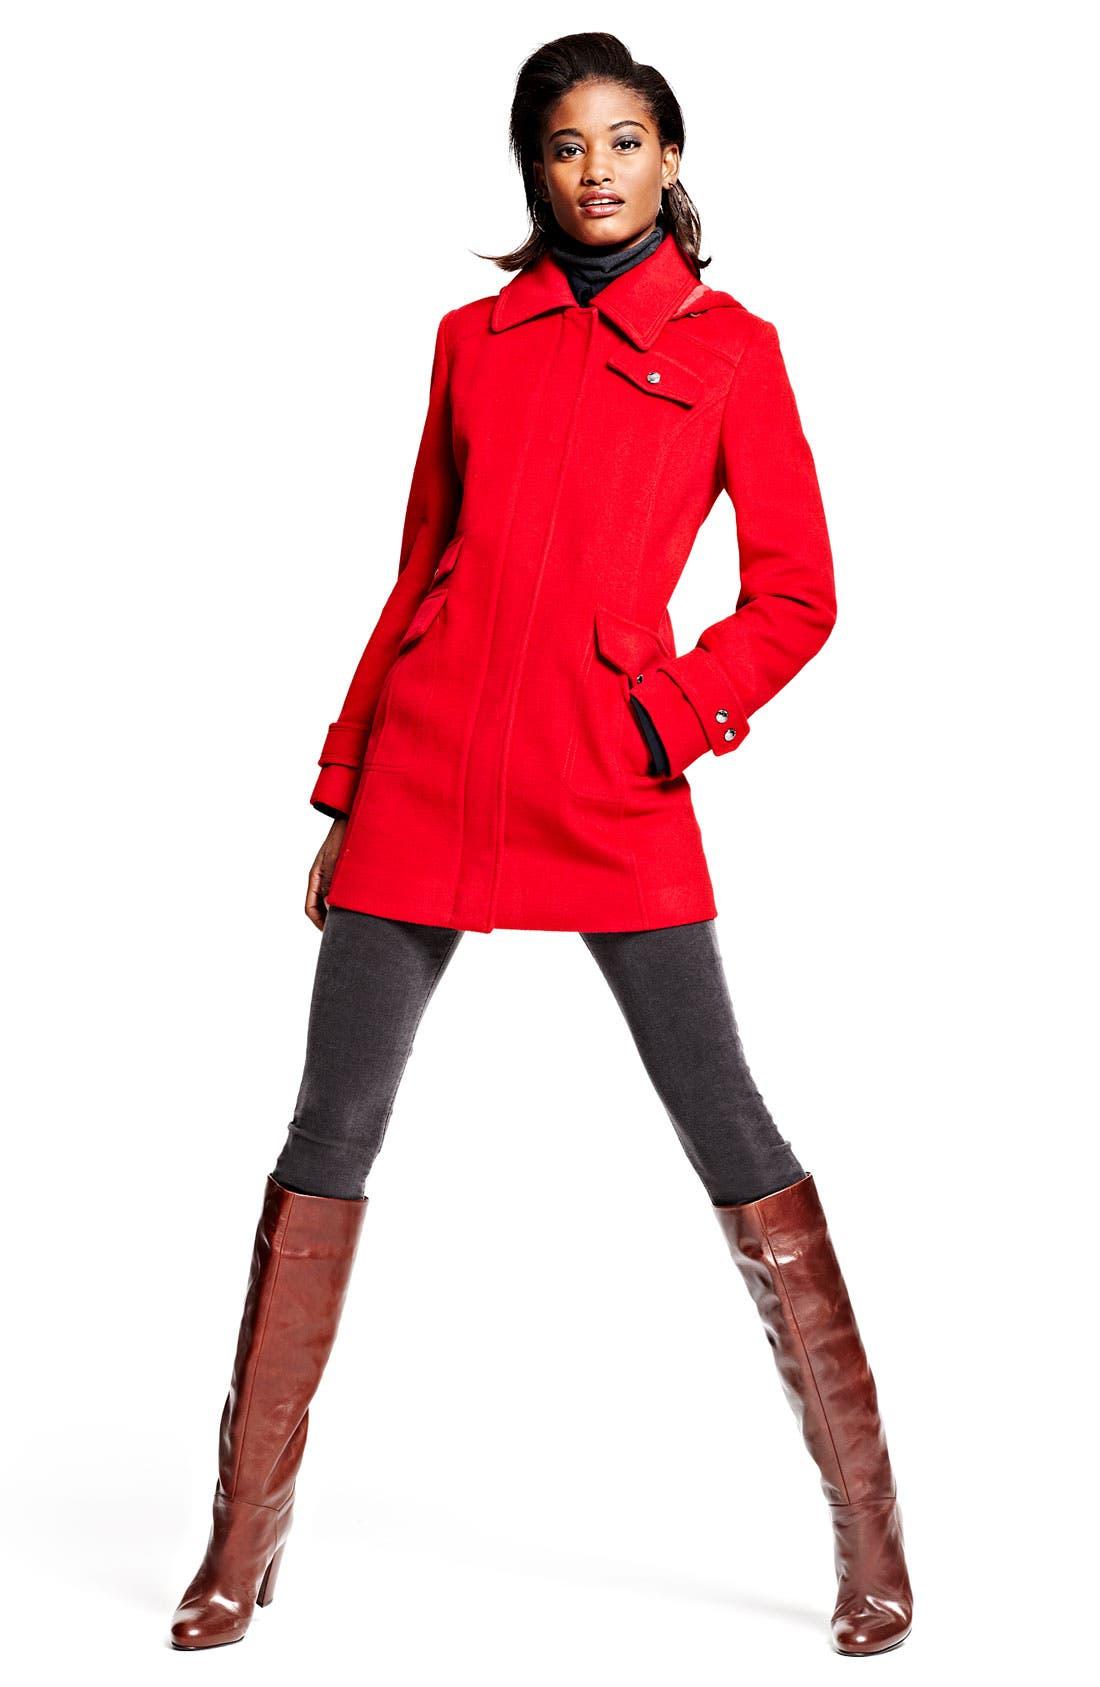 Alternate Image 1 Selected - Ellen Tracy Coat, KUT from the Kloth Cords & Stuart Weitzman Boot